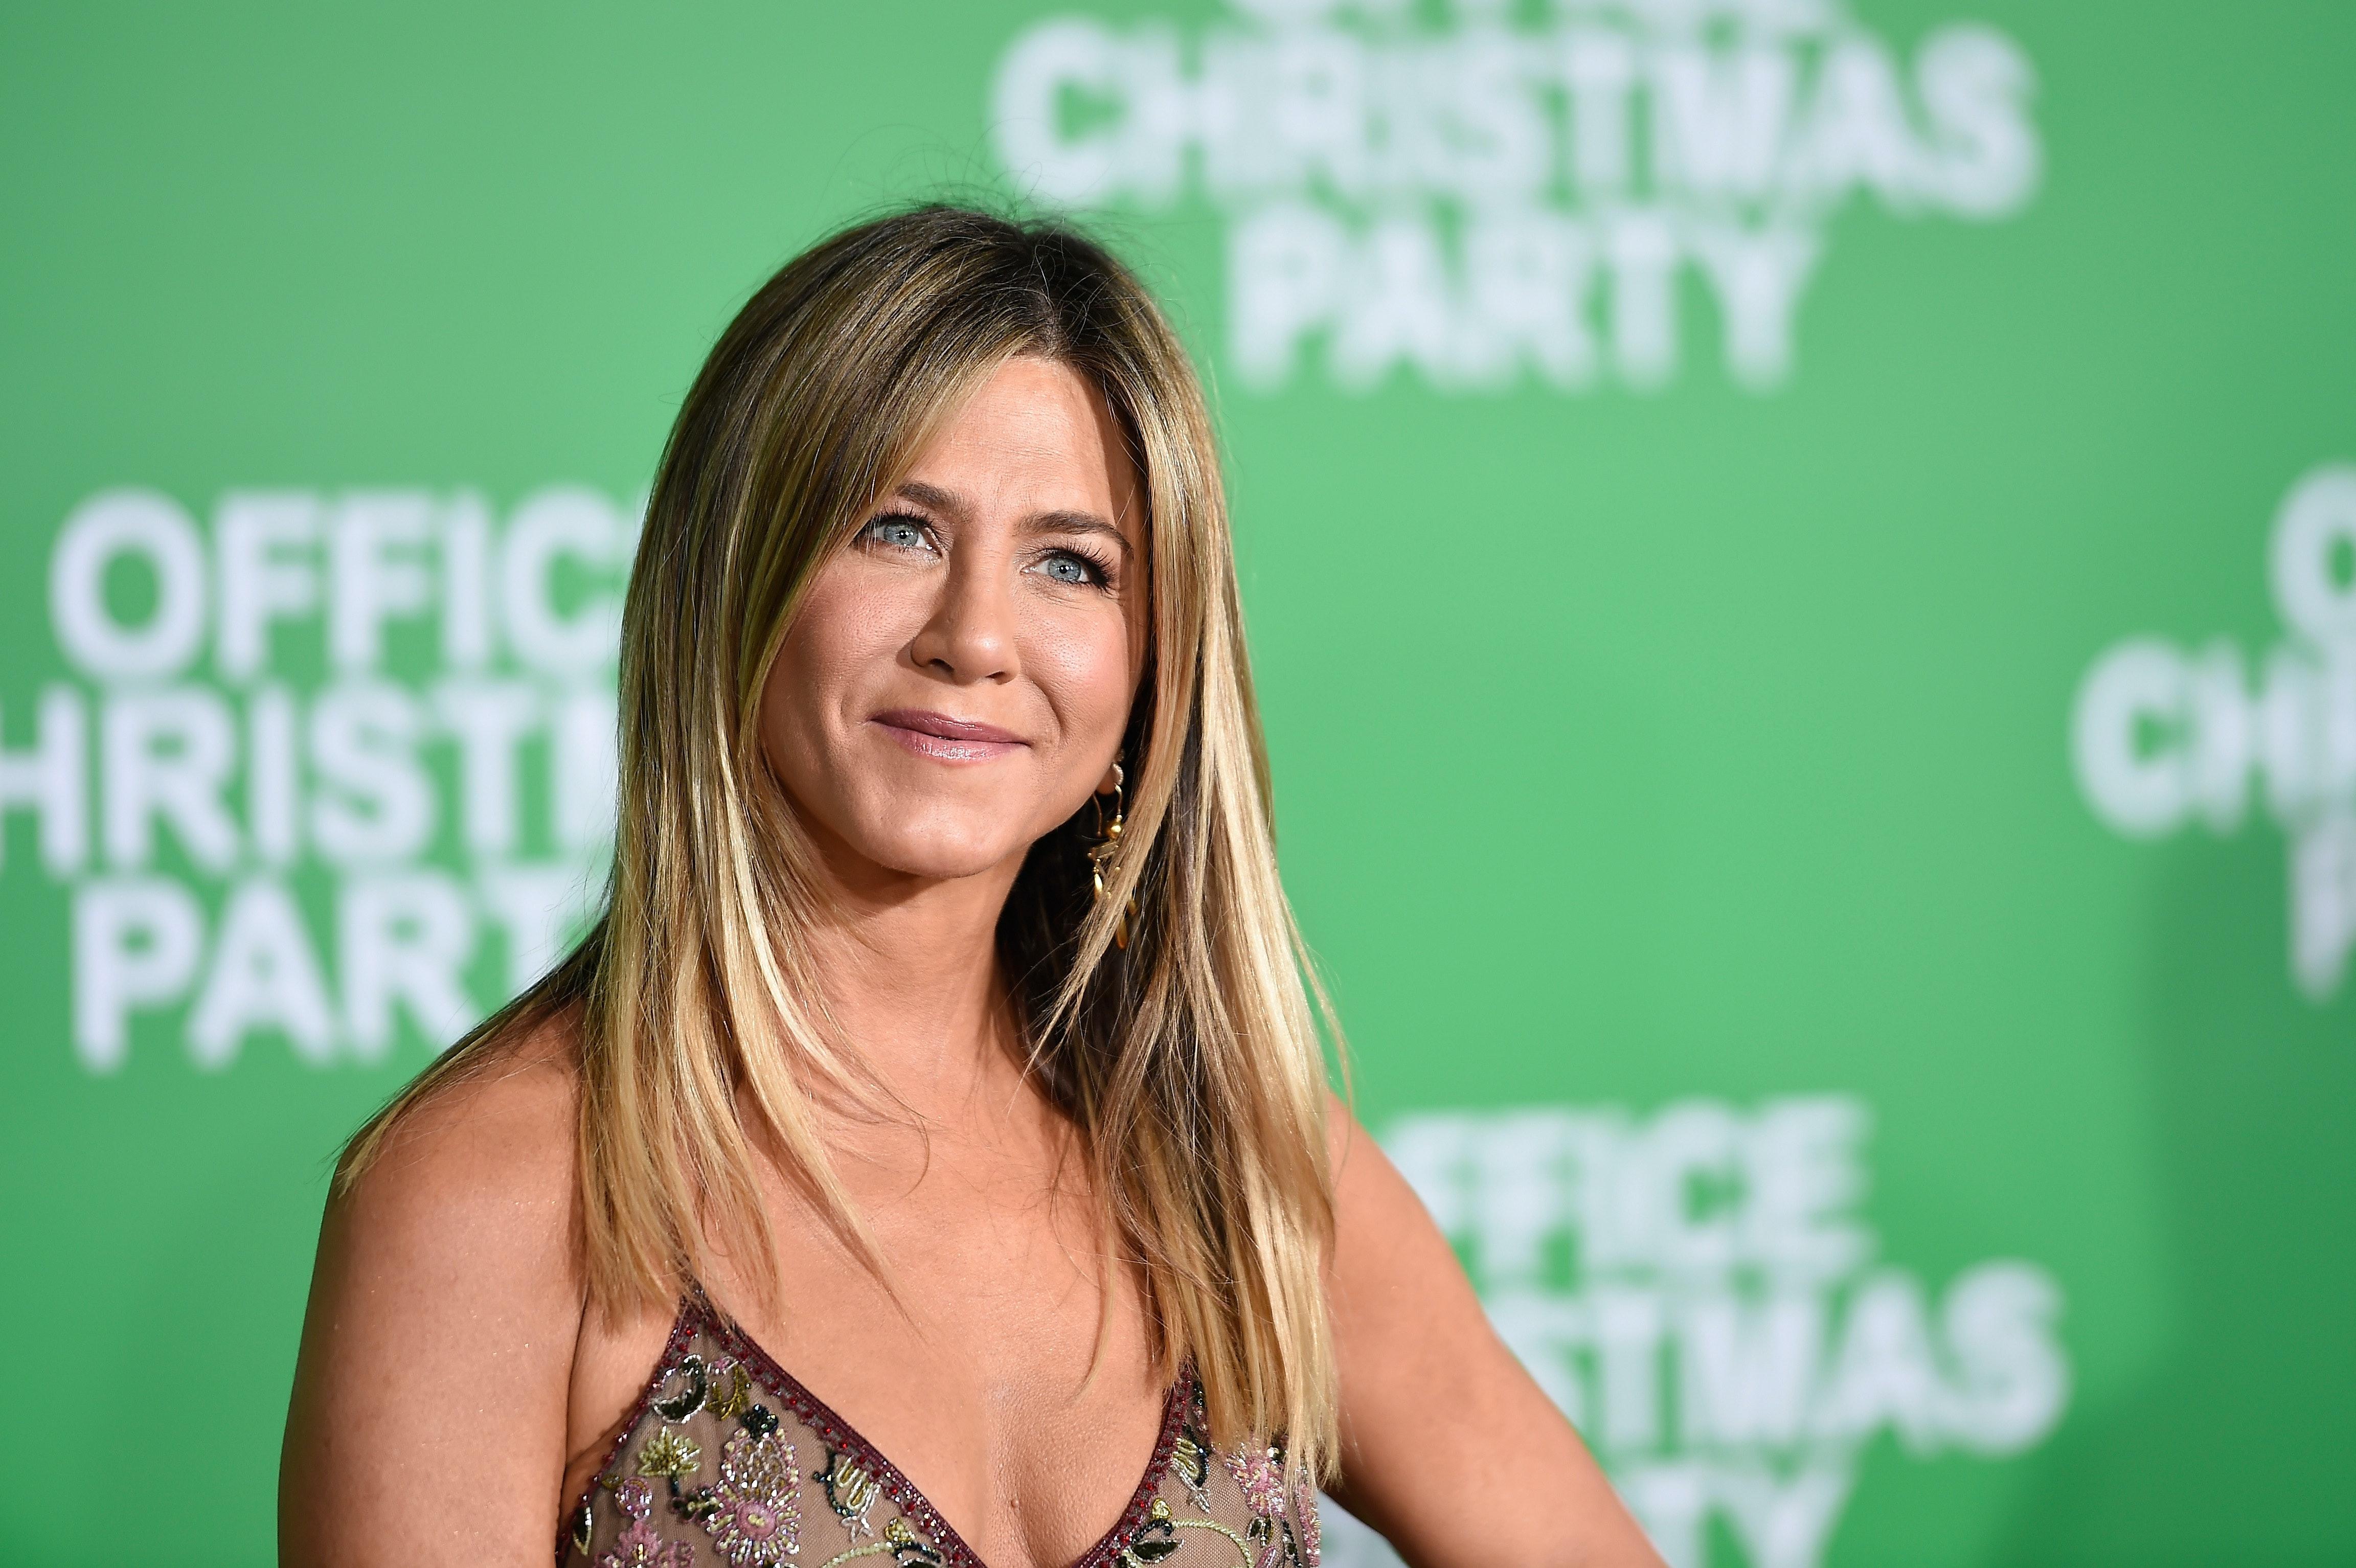 Jennifer Aniston's Birthday Celebration Had A Mini 'Friends